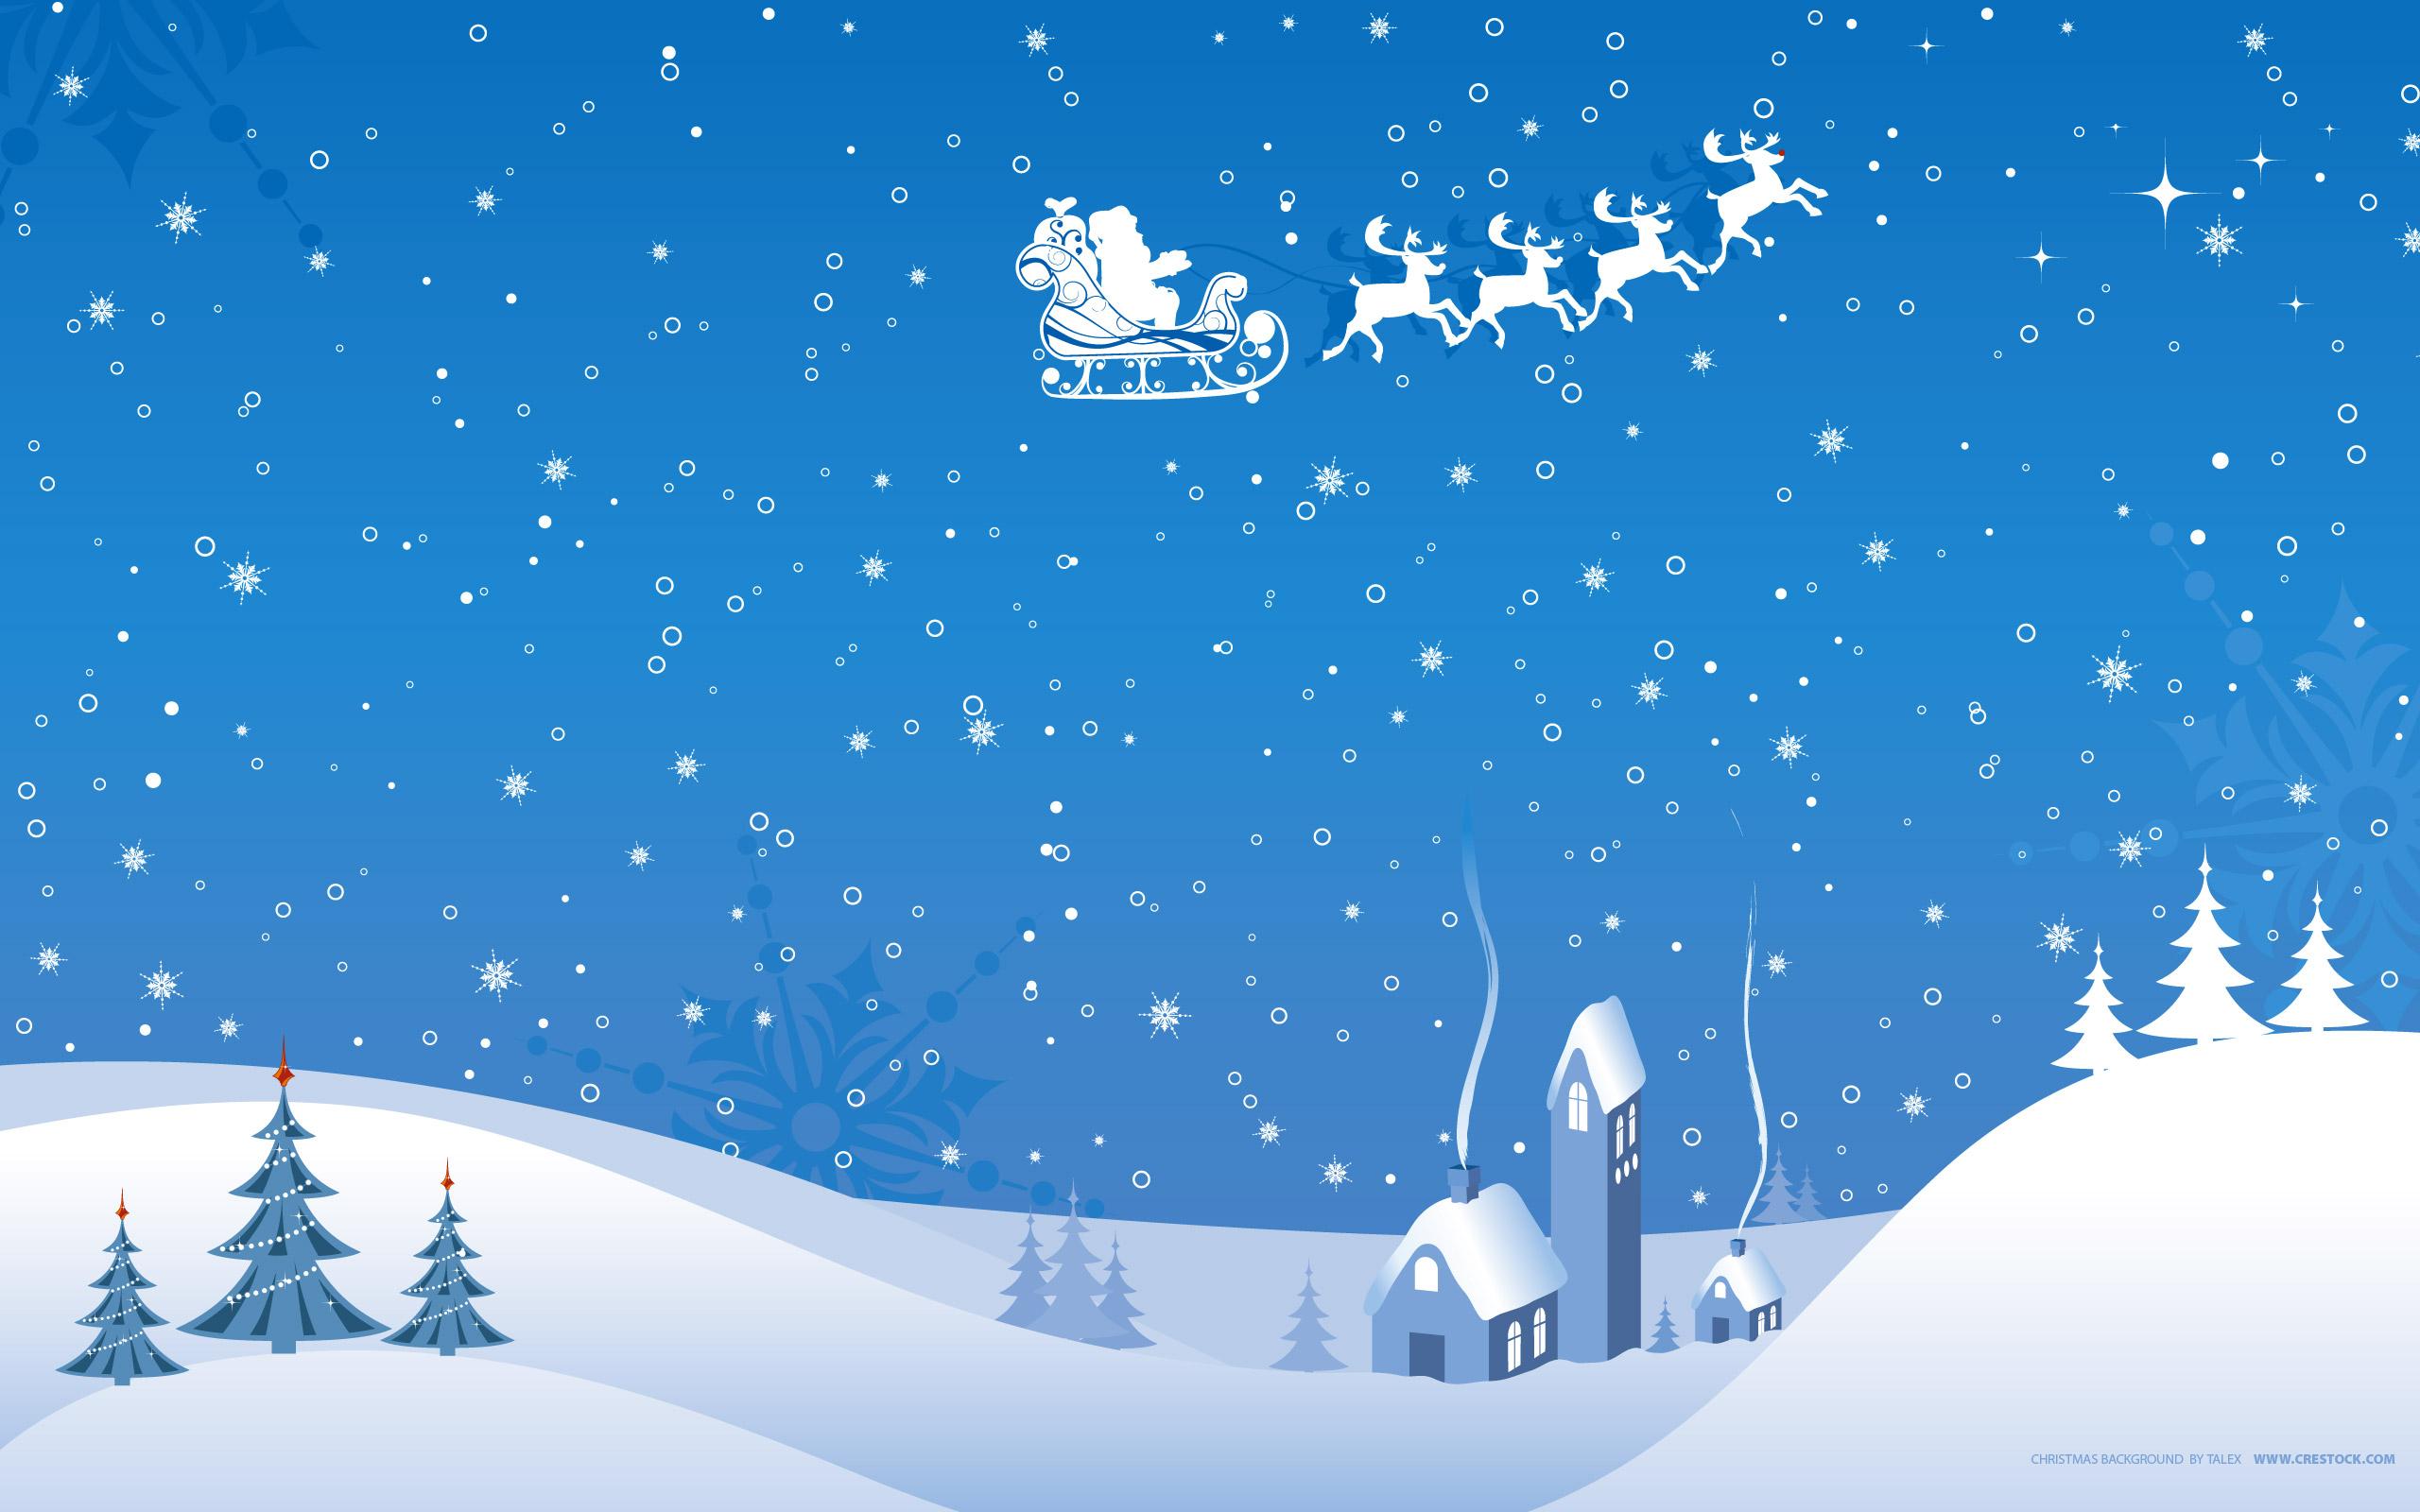 Christmas Winter Vector Wallpaper for Desktop 2560x1600